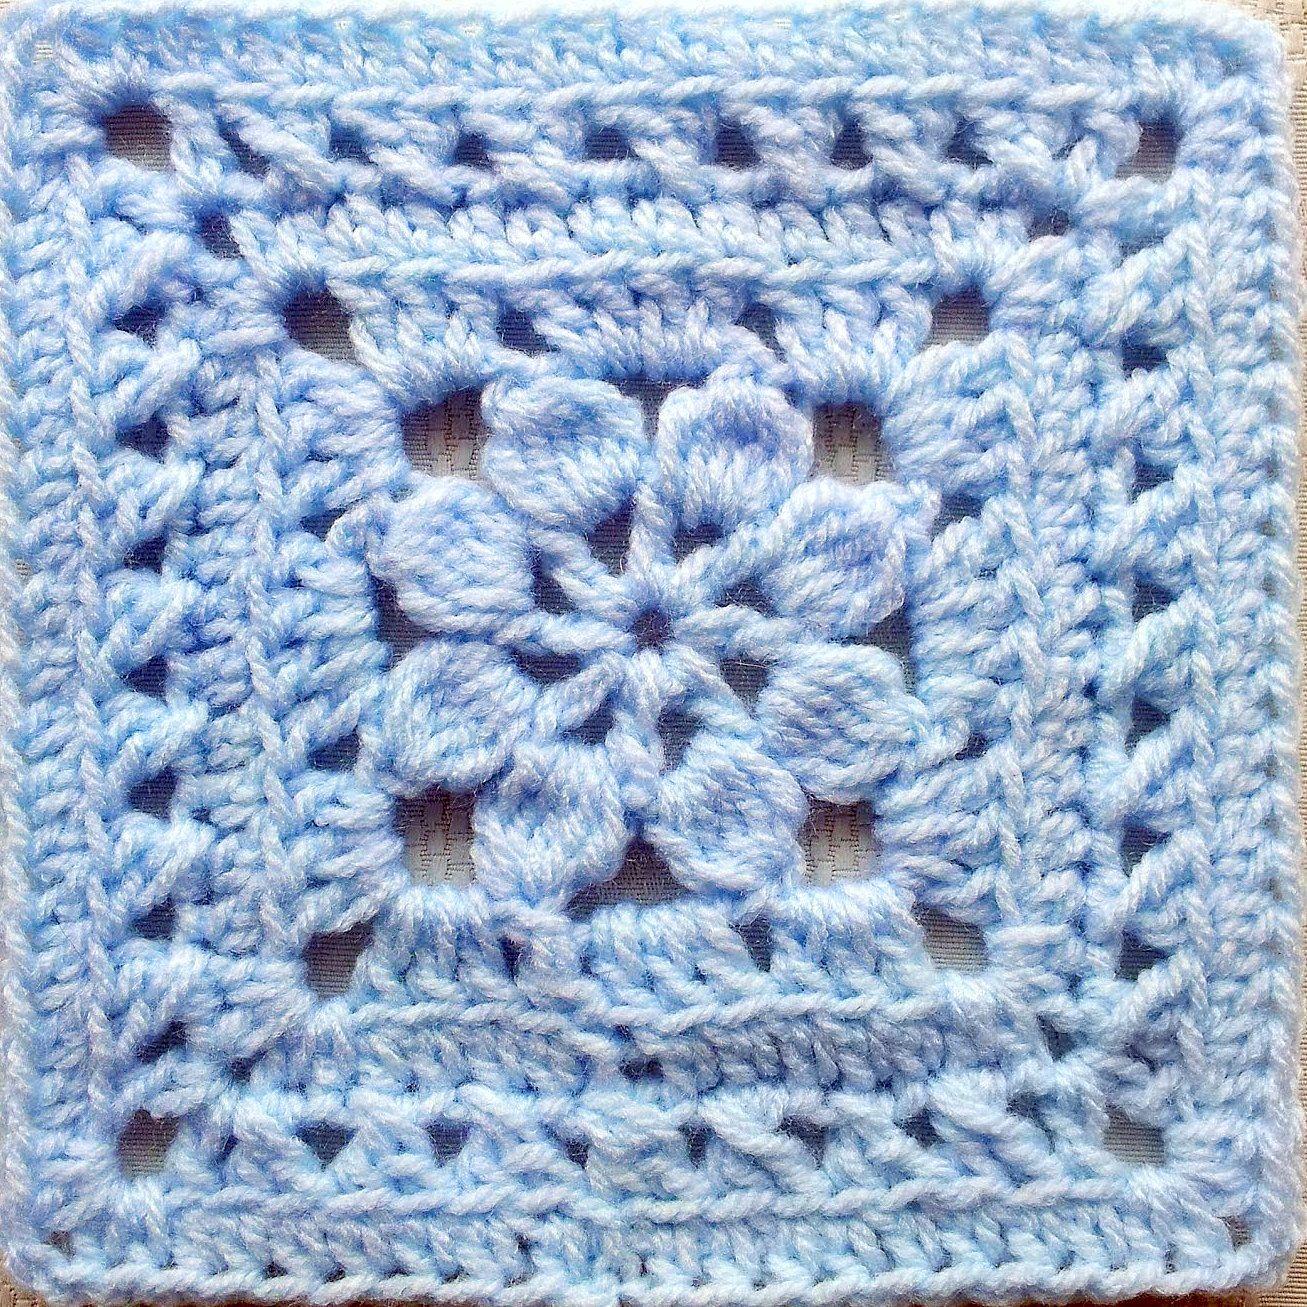 Walled Garden Square (pattern) | patrate, motive | Pinterest ...